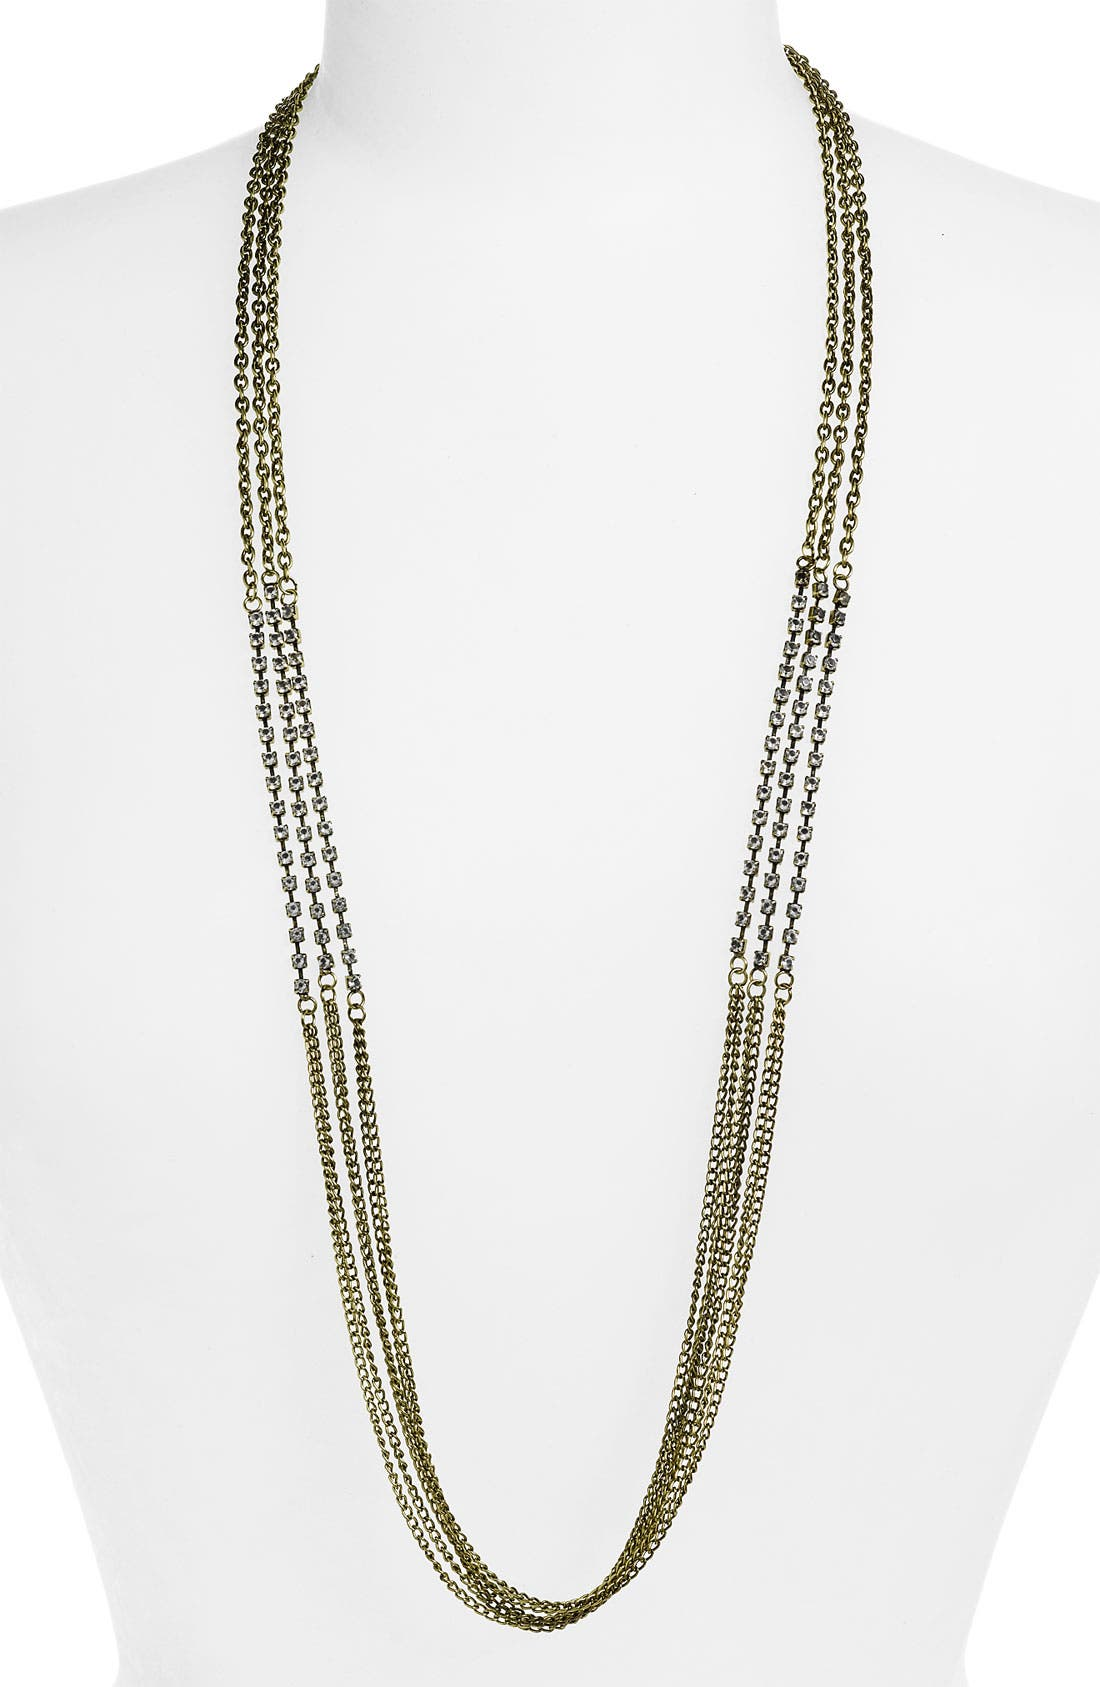 Main Image - Stephan & Co. Triple Row Chain & Rhinestone Necklace